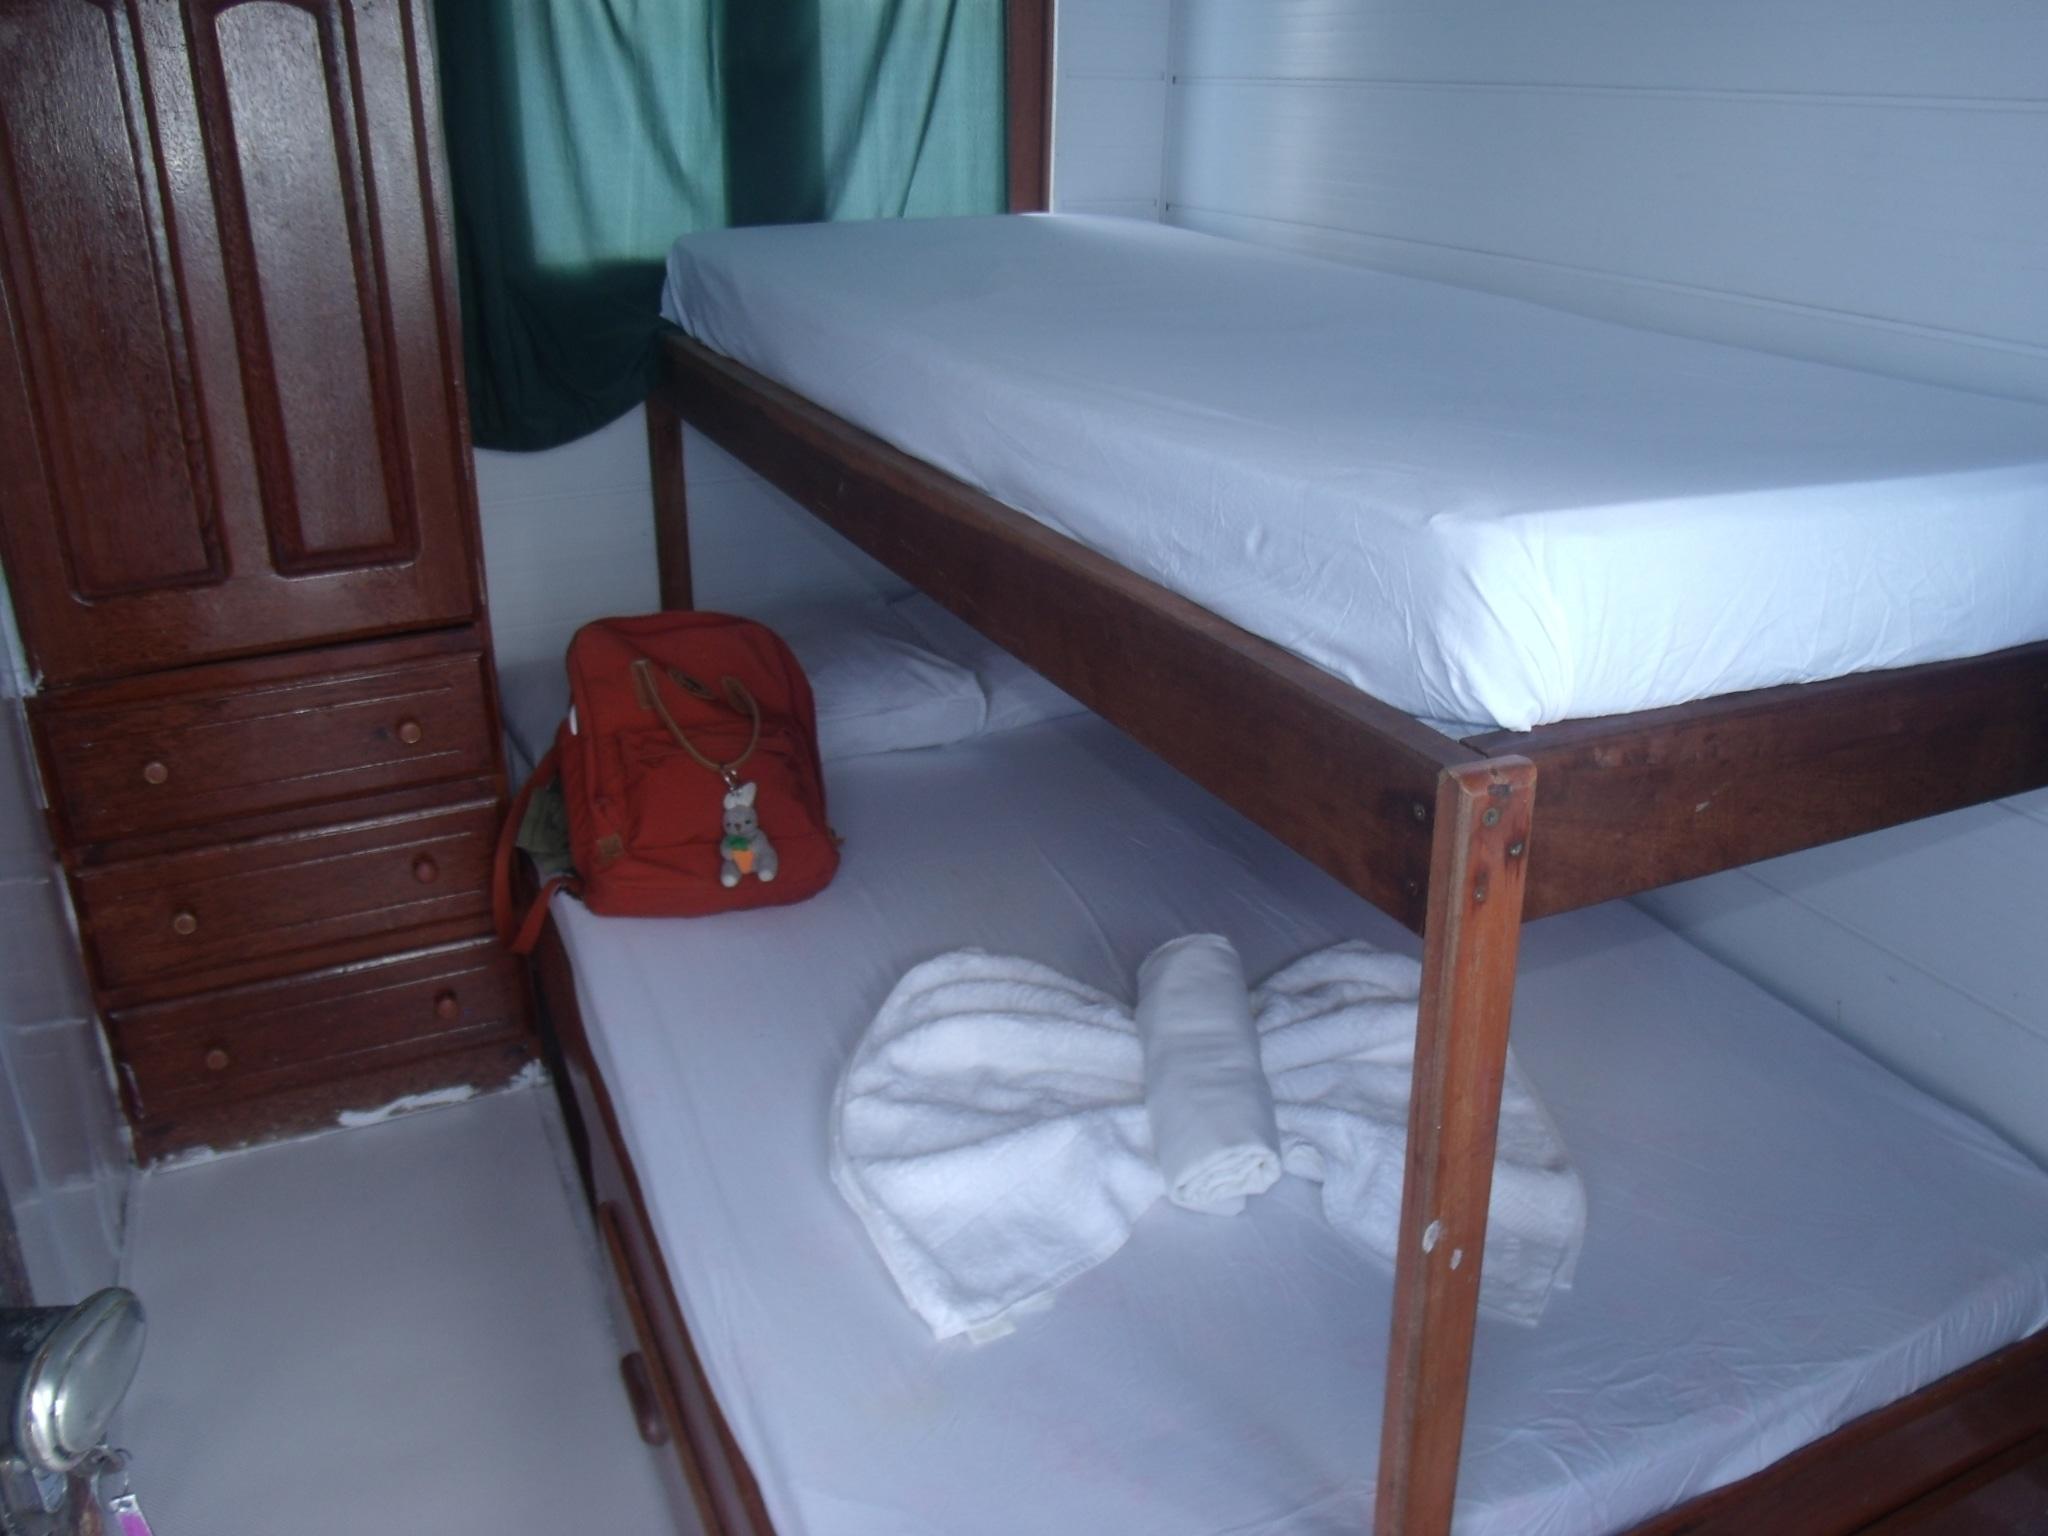 Nicely prepared bed